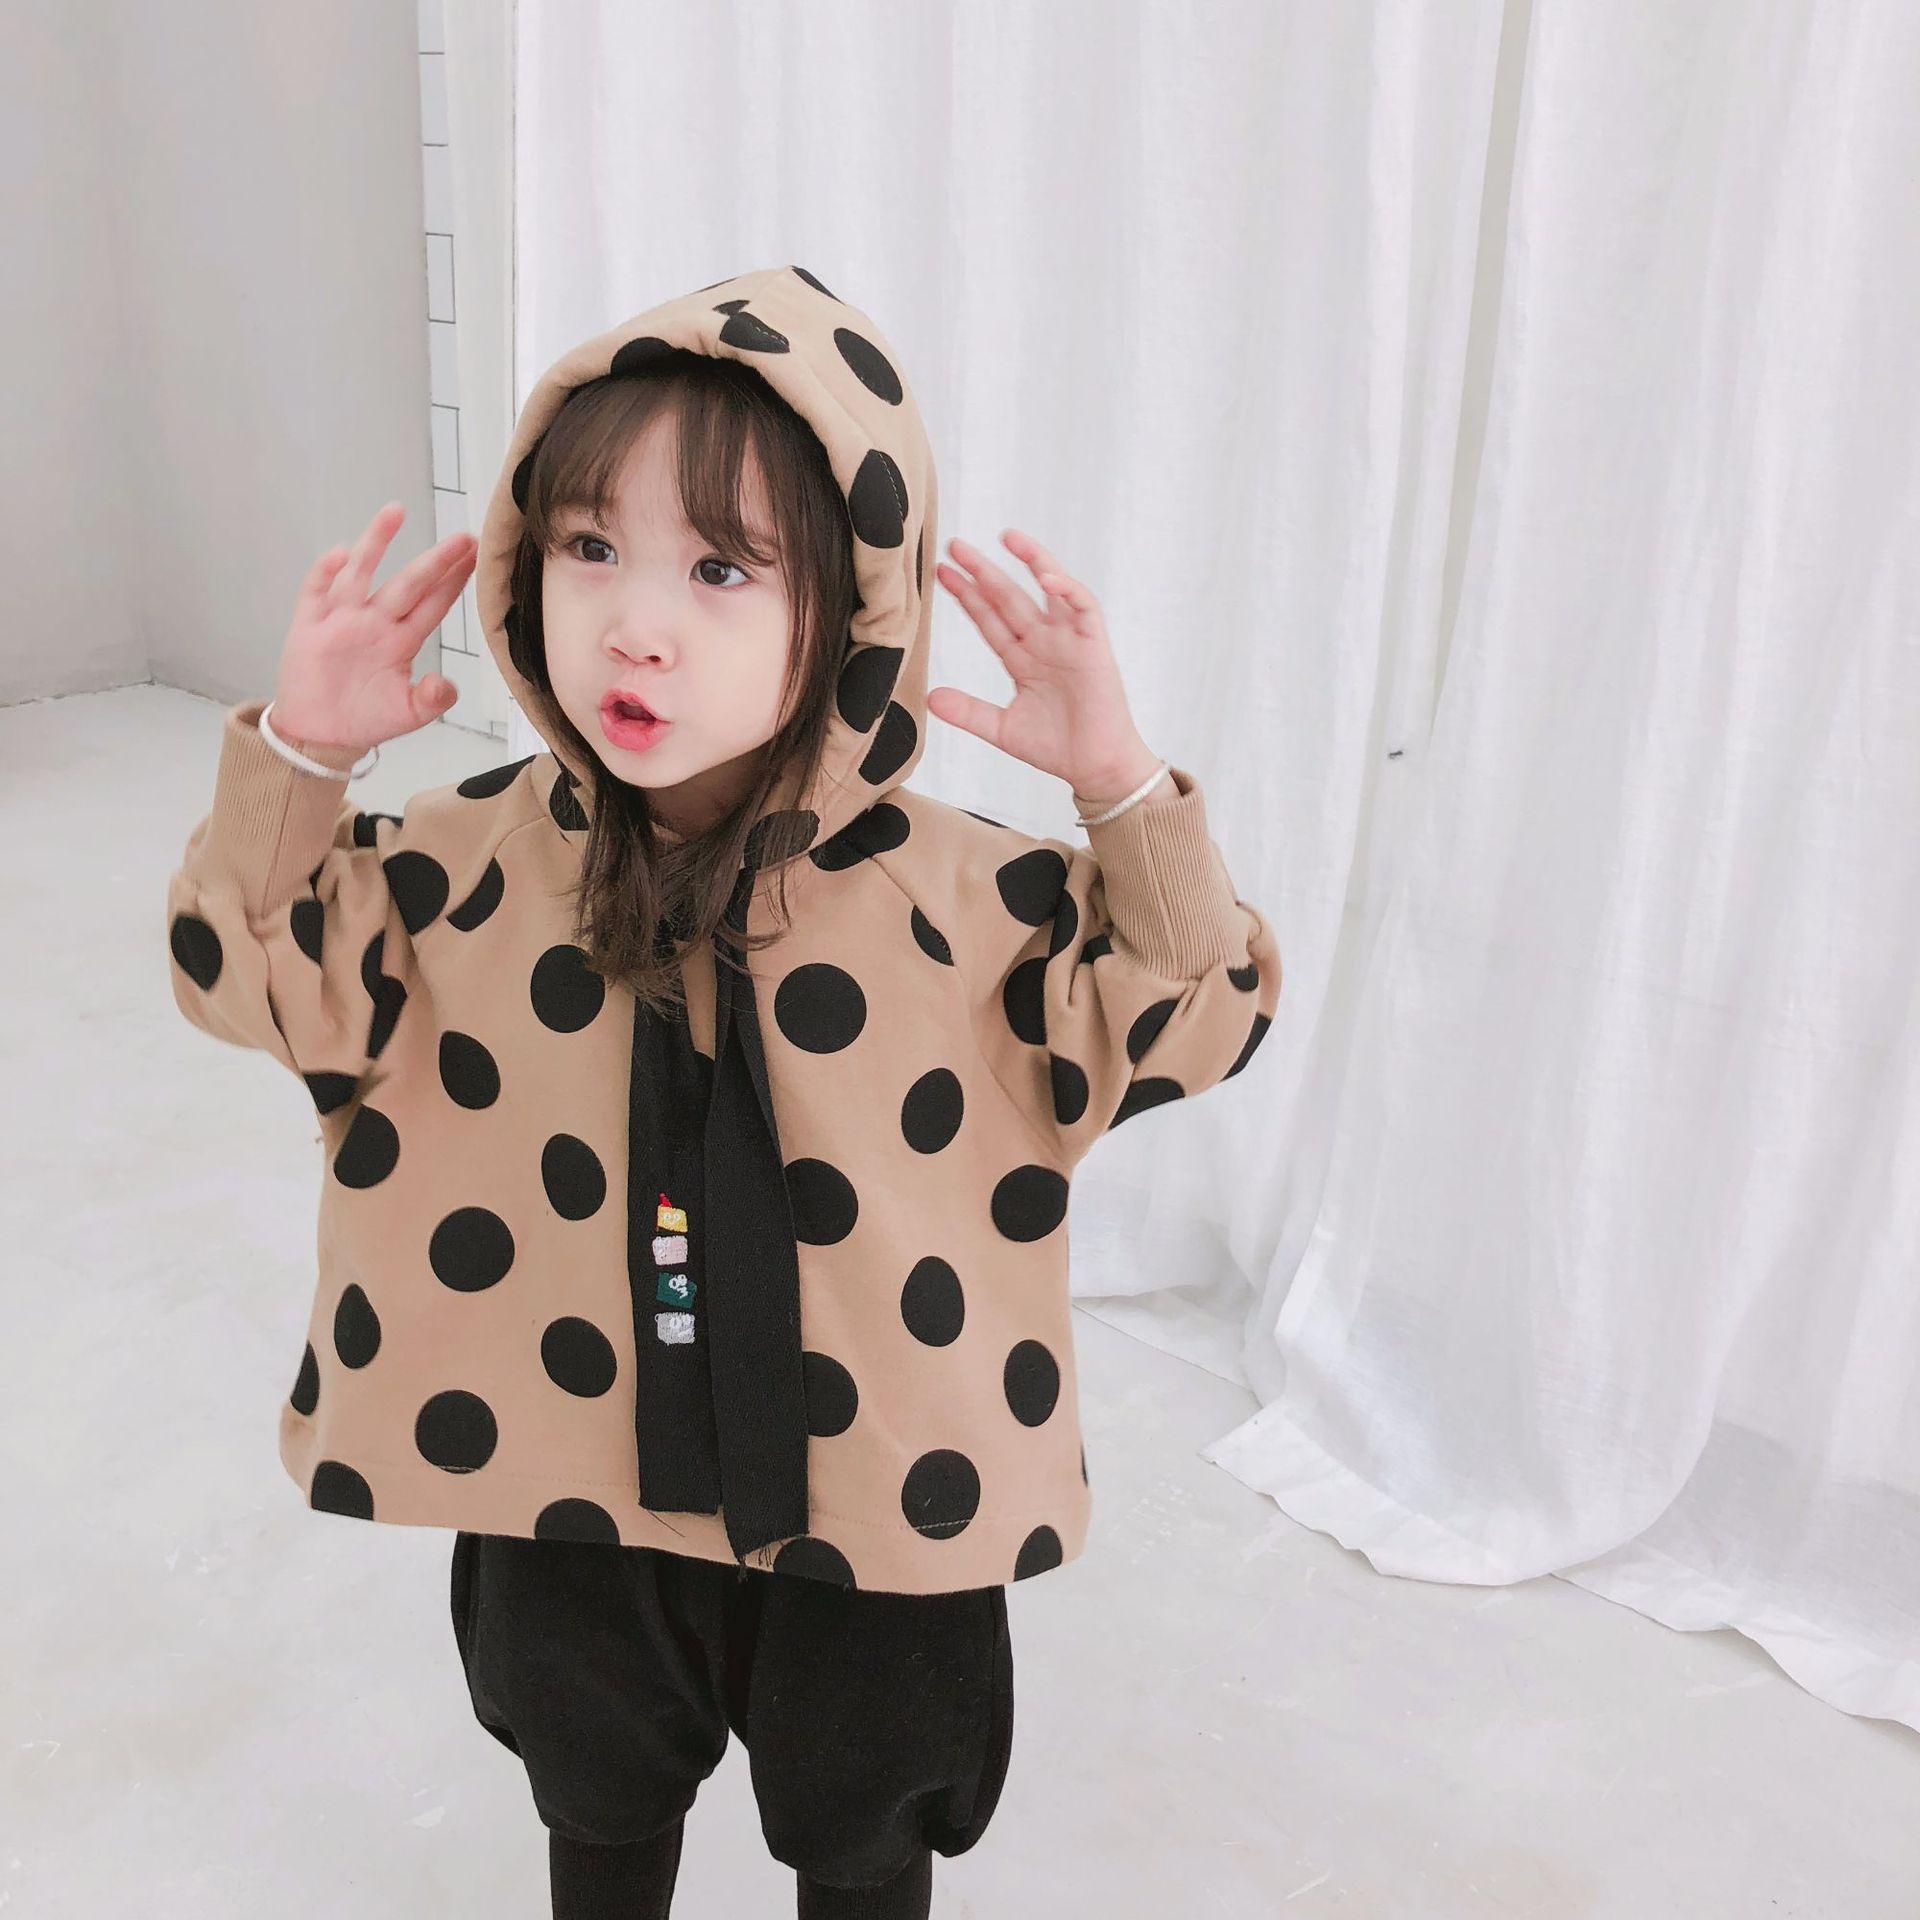 Sweatshirt Pullovers Long-Sleeve Girls Autumn Kids Children Hooded for Tees 2-7Y Polka-Dot